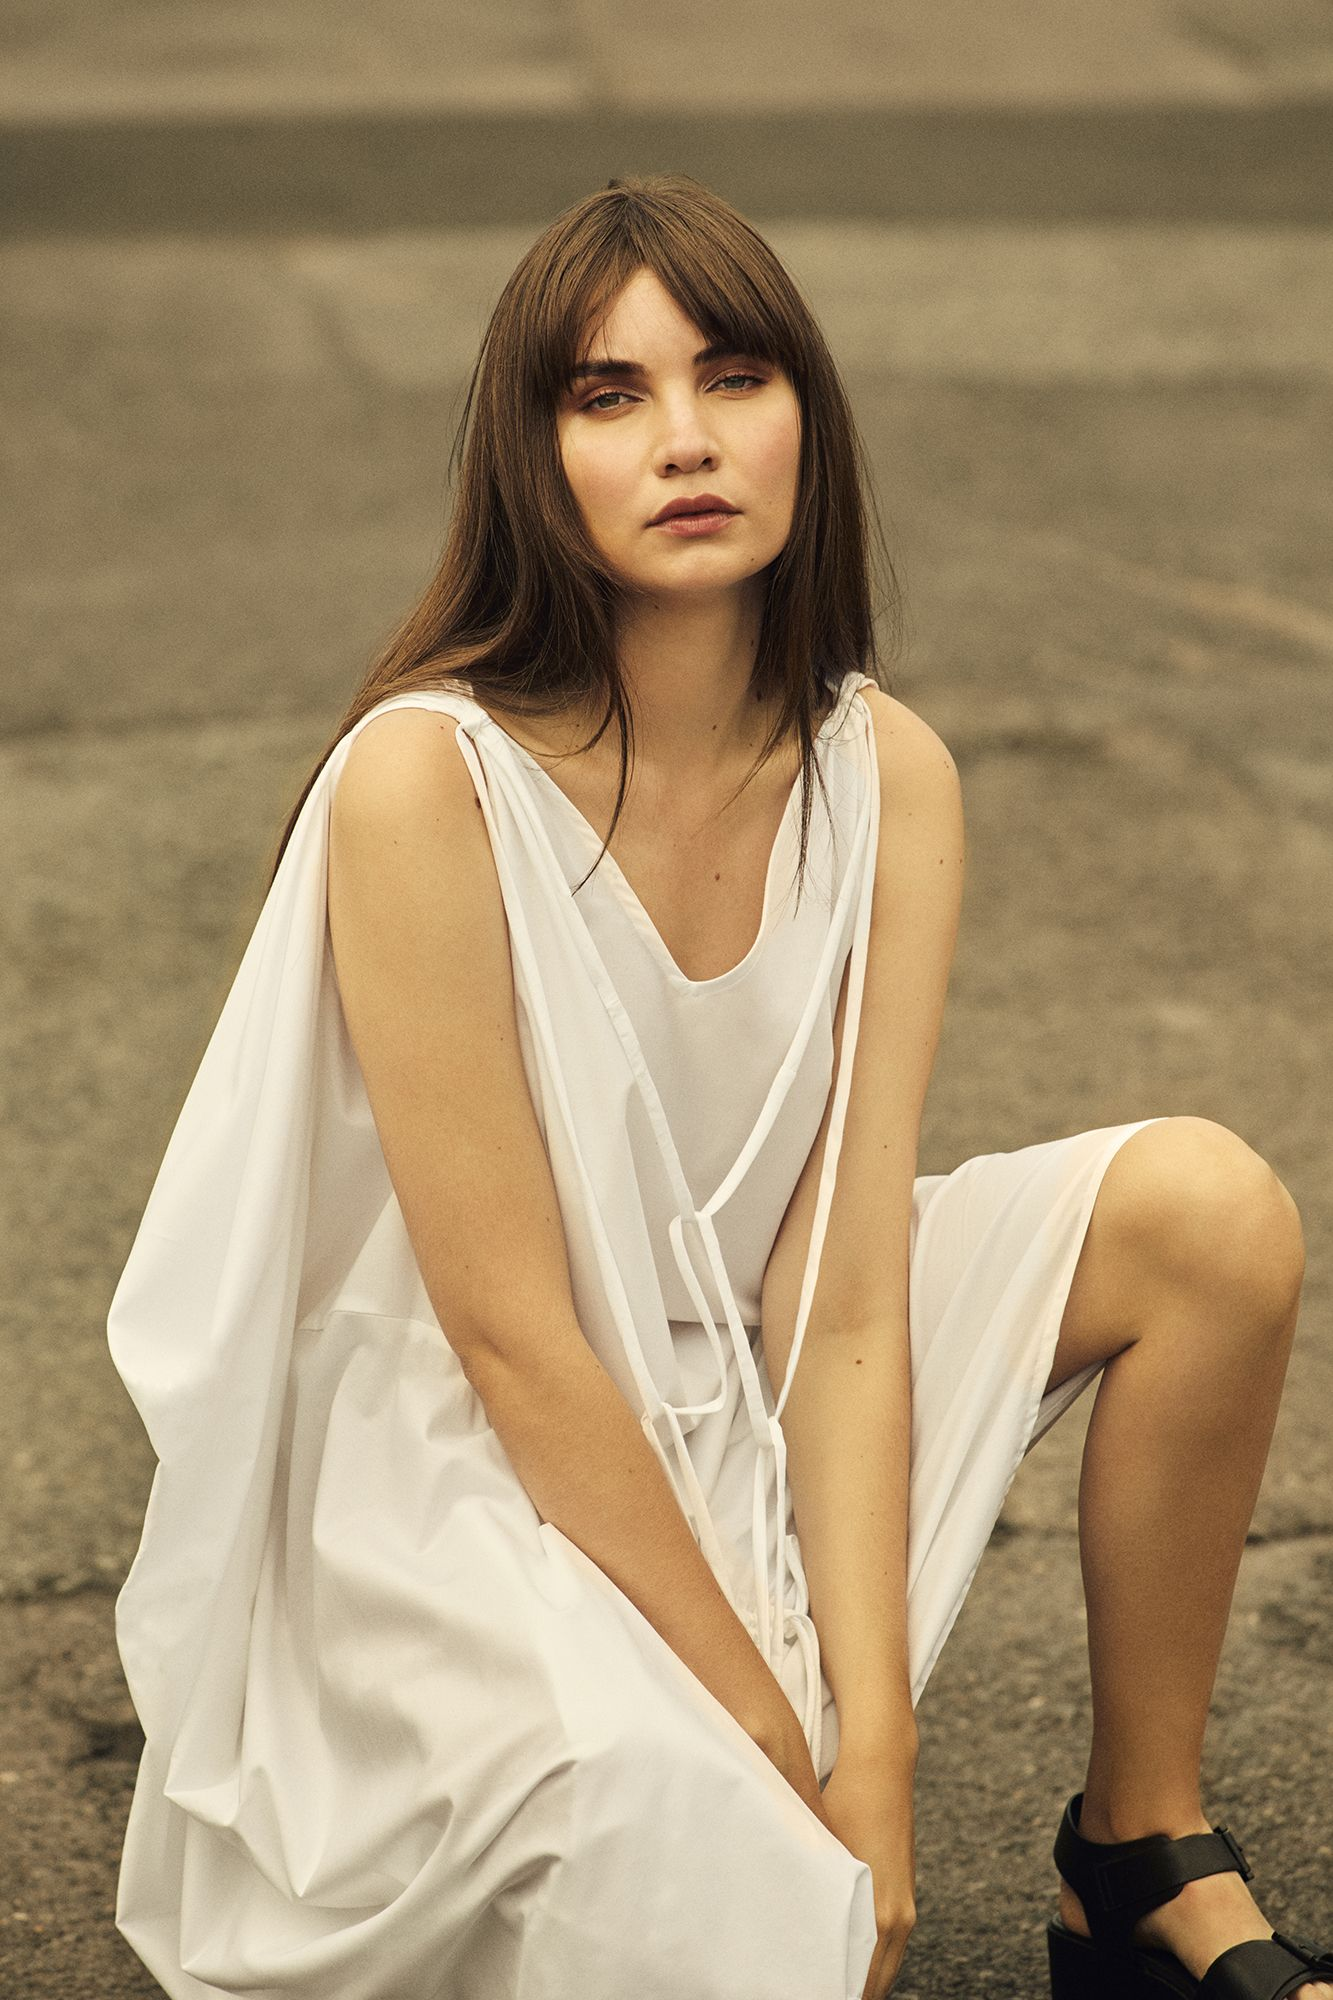 BREATHING / MAKU LÓPEZ | Fashion Editorial: Sunshine